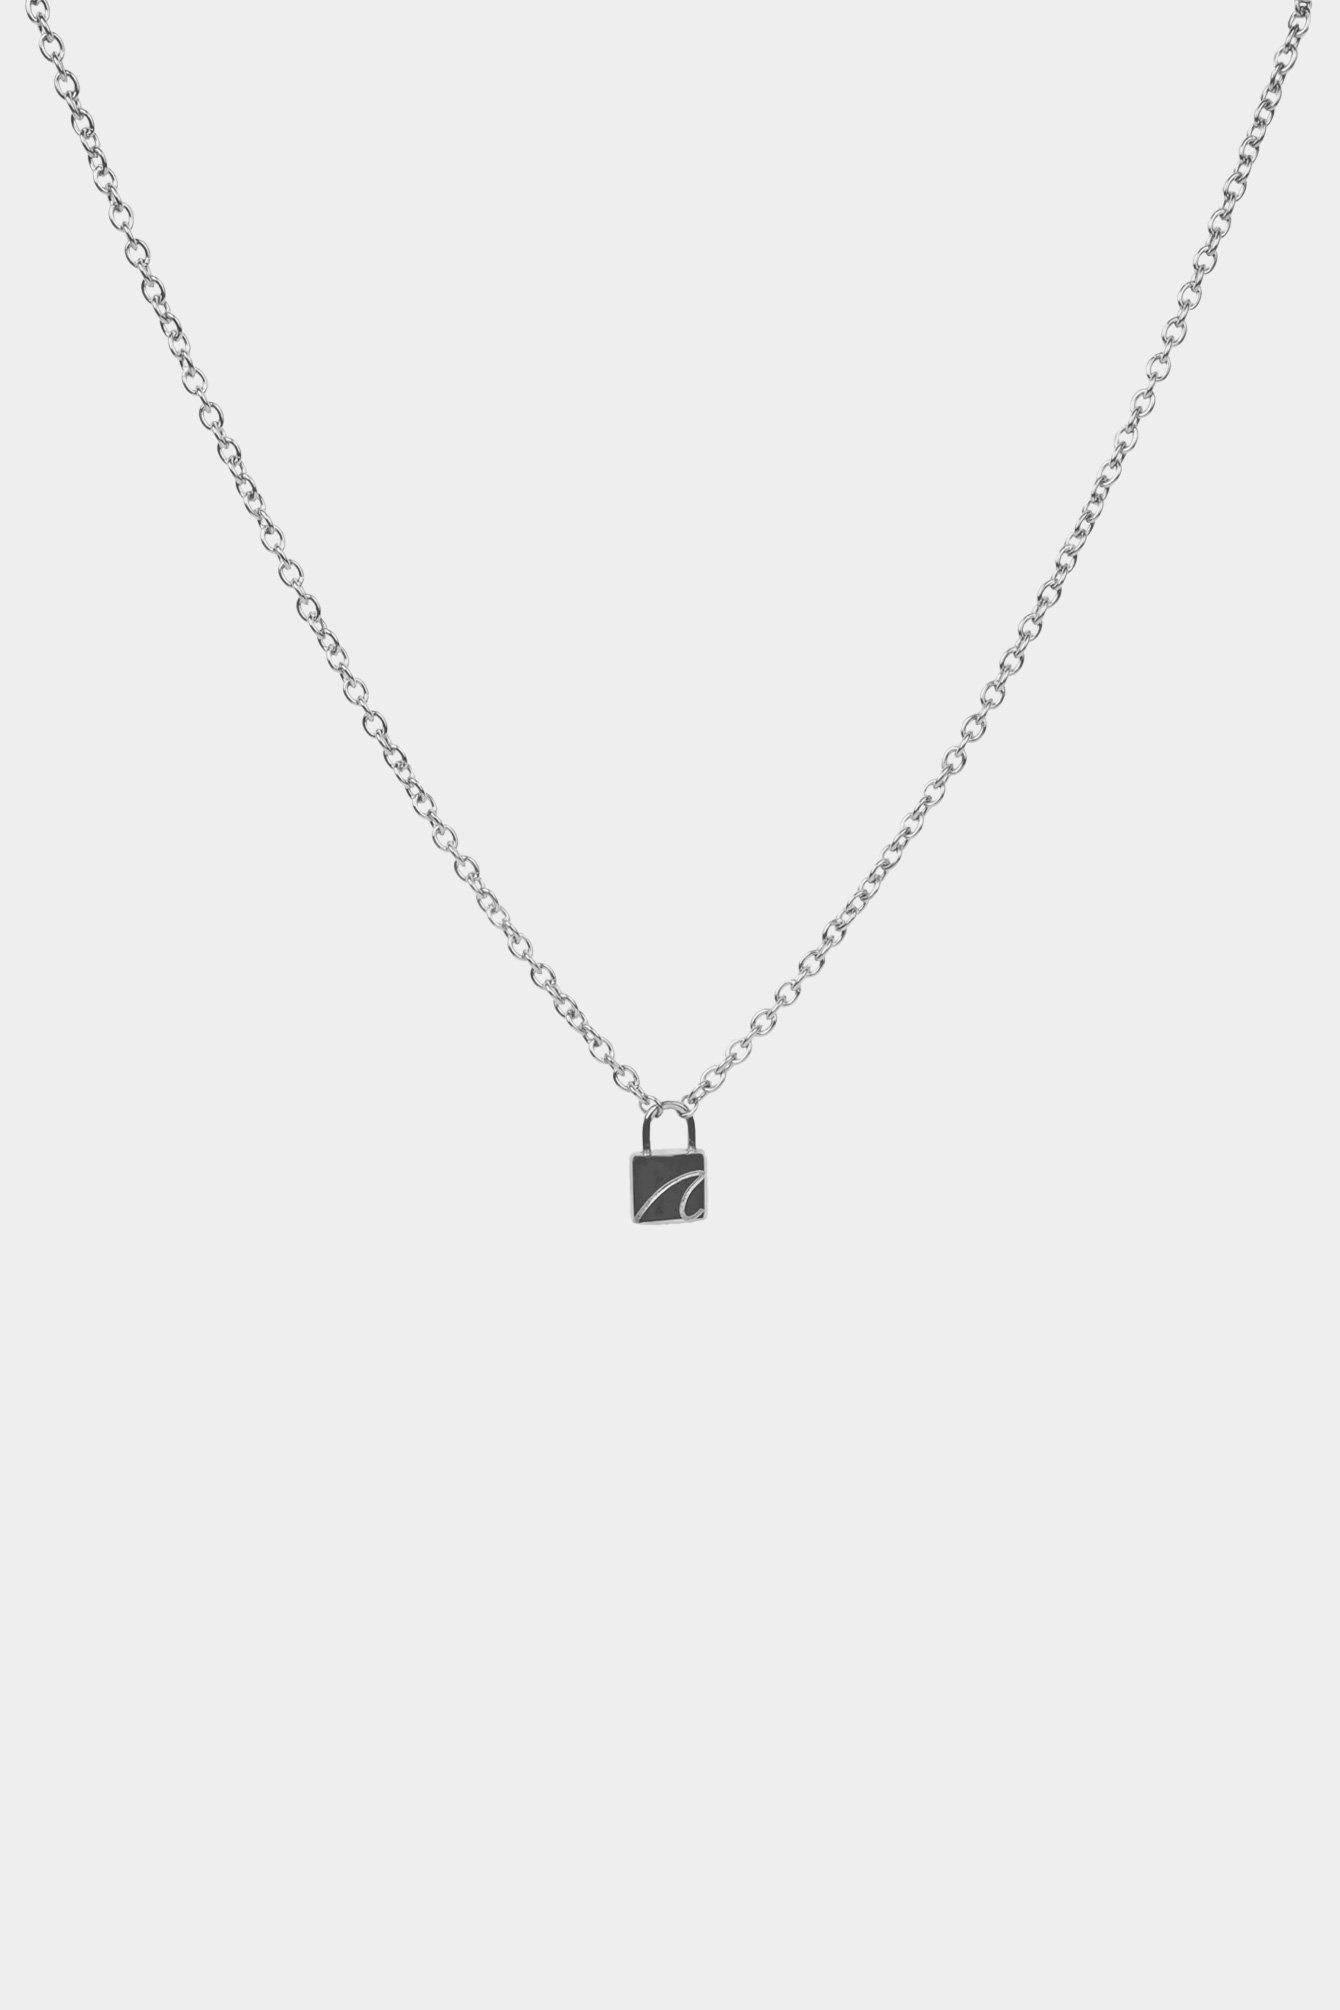 Slot chain silver